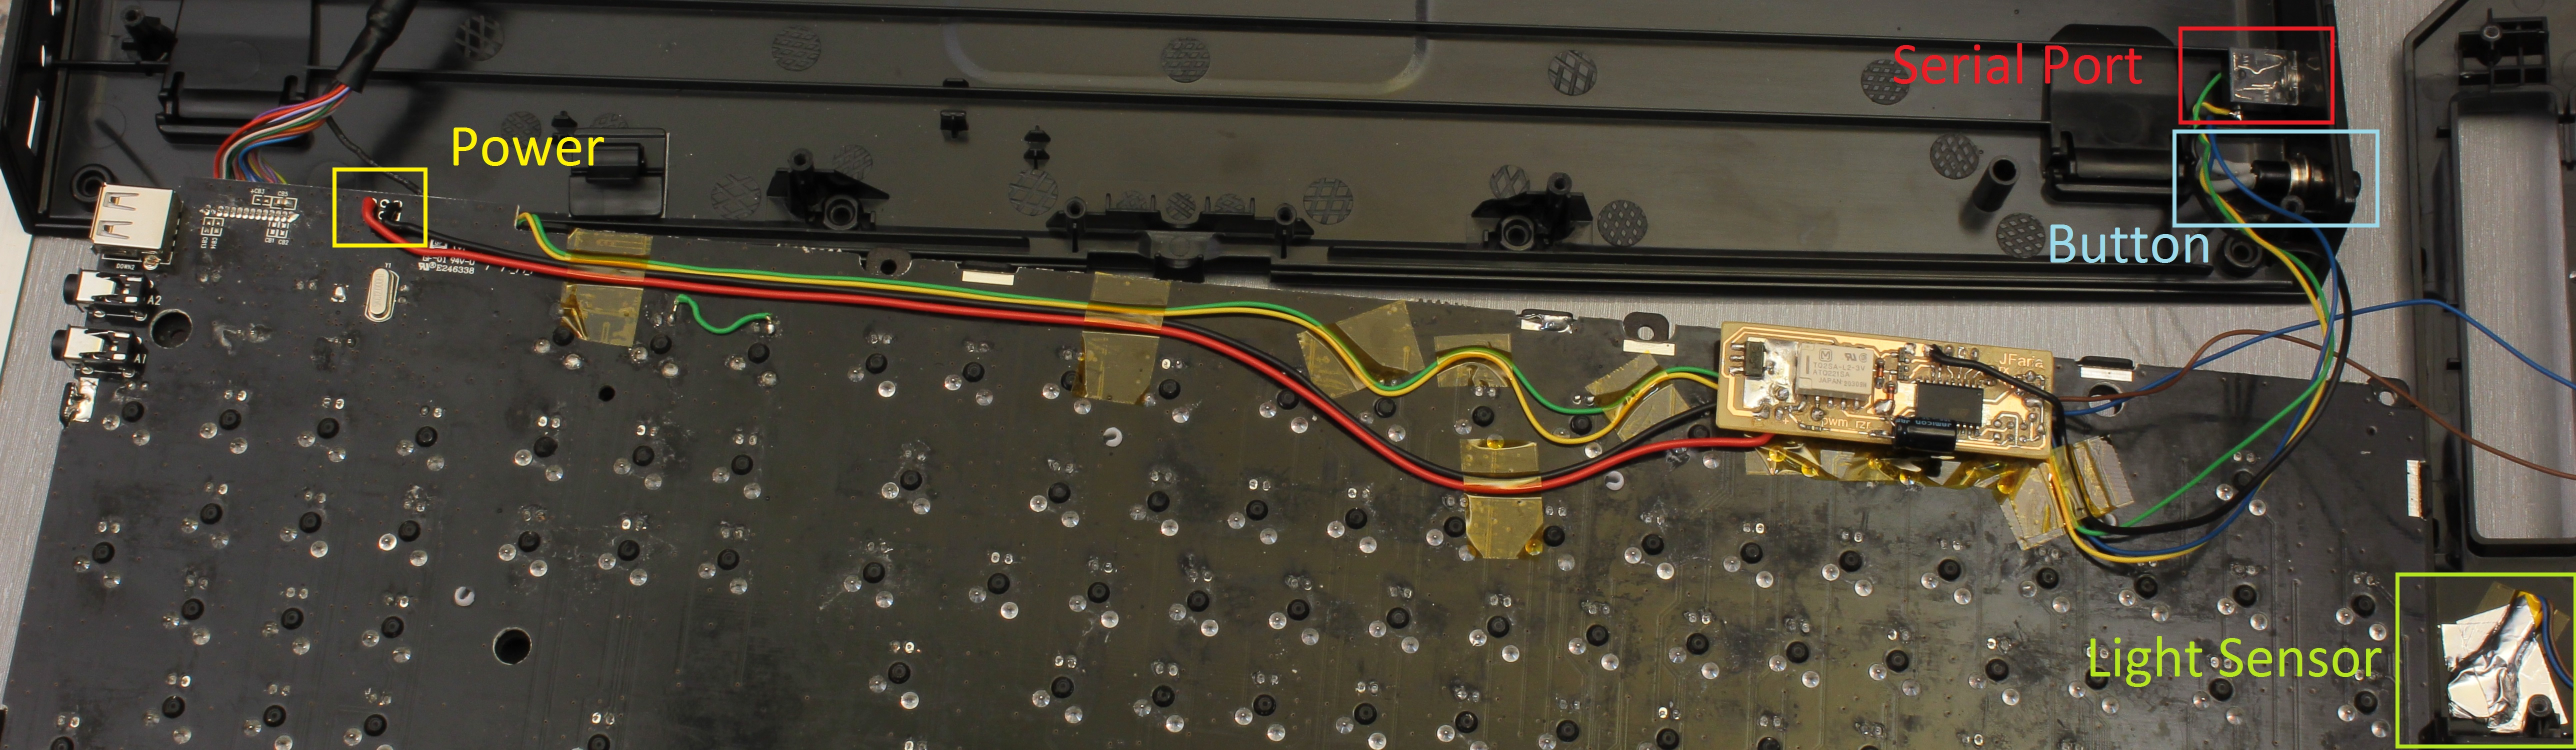 Razer Lycosa Keyboard Usb Plug Wiring Diagram Auto Electrical Schematic